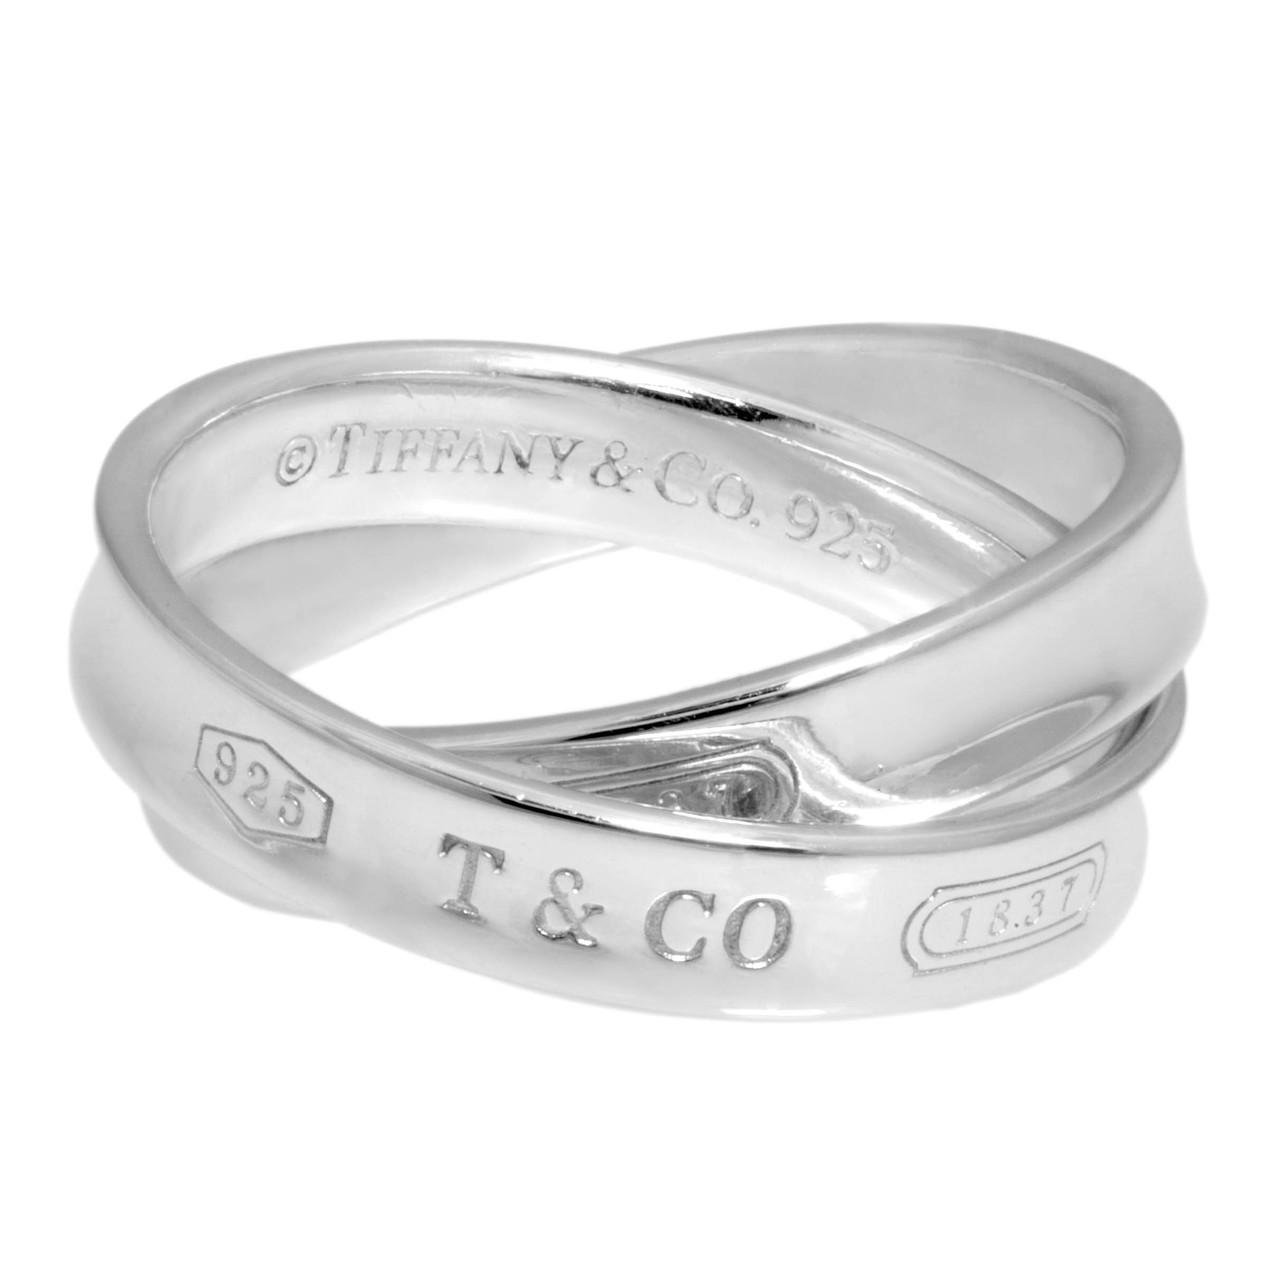 3de442ab1 Tiffany & Co. Sterling Silver 1837 Interlocking Circles Ring - modaselle